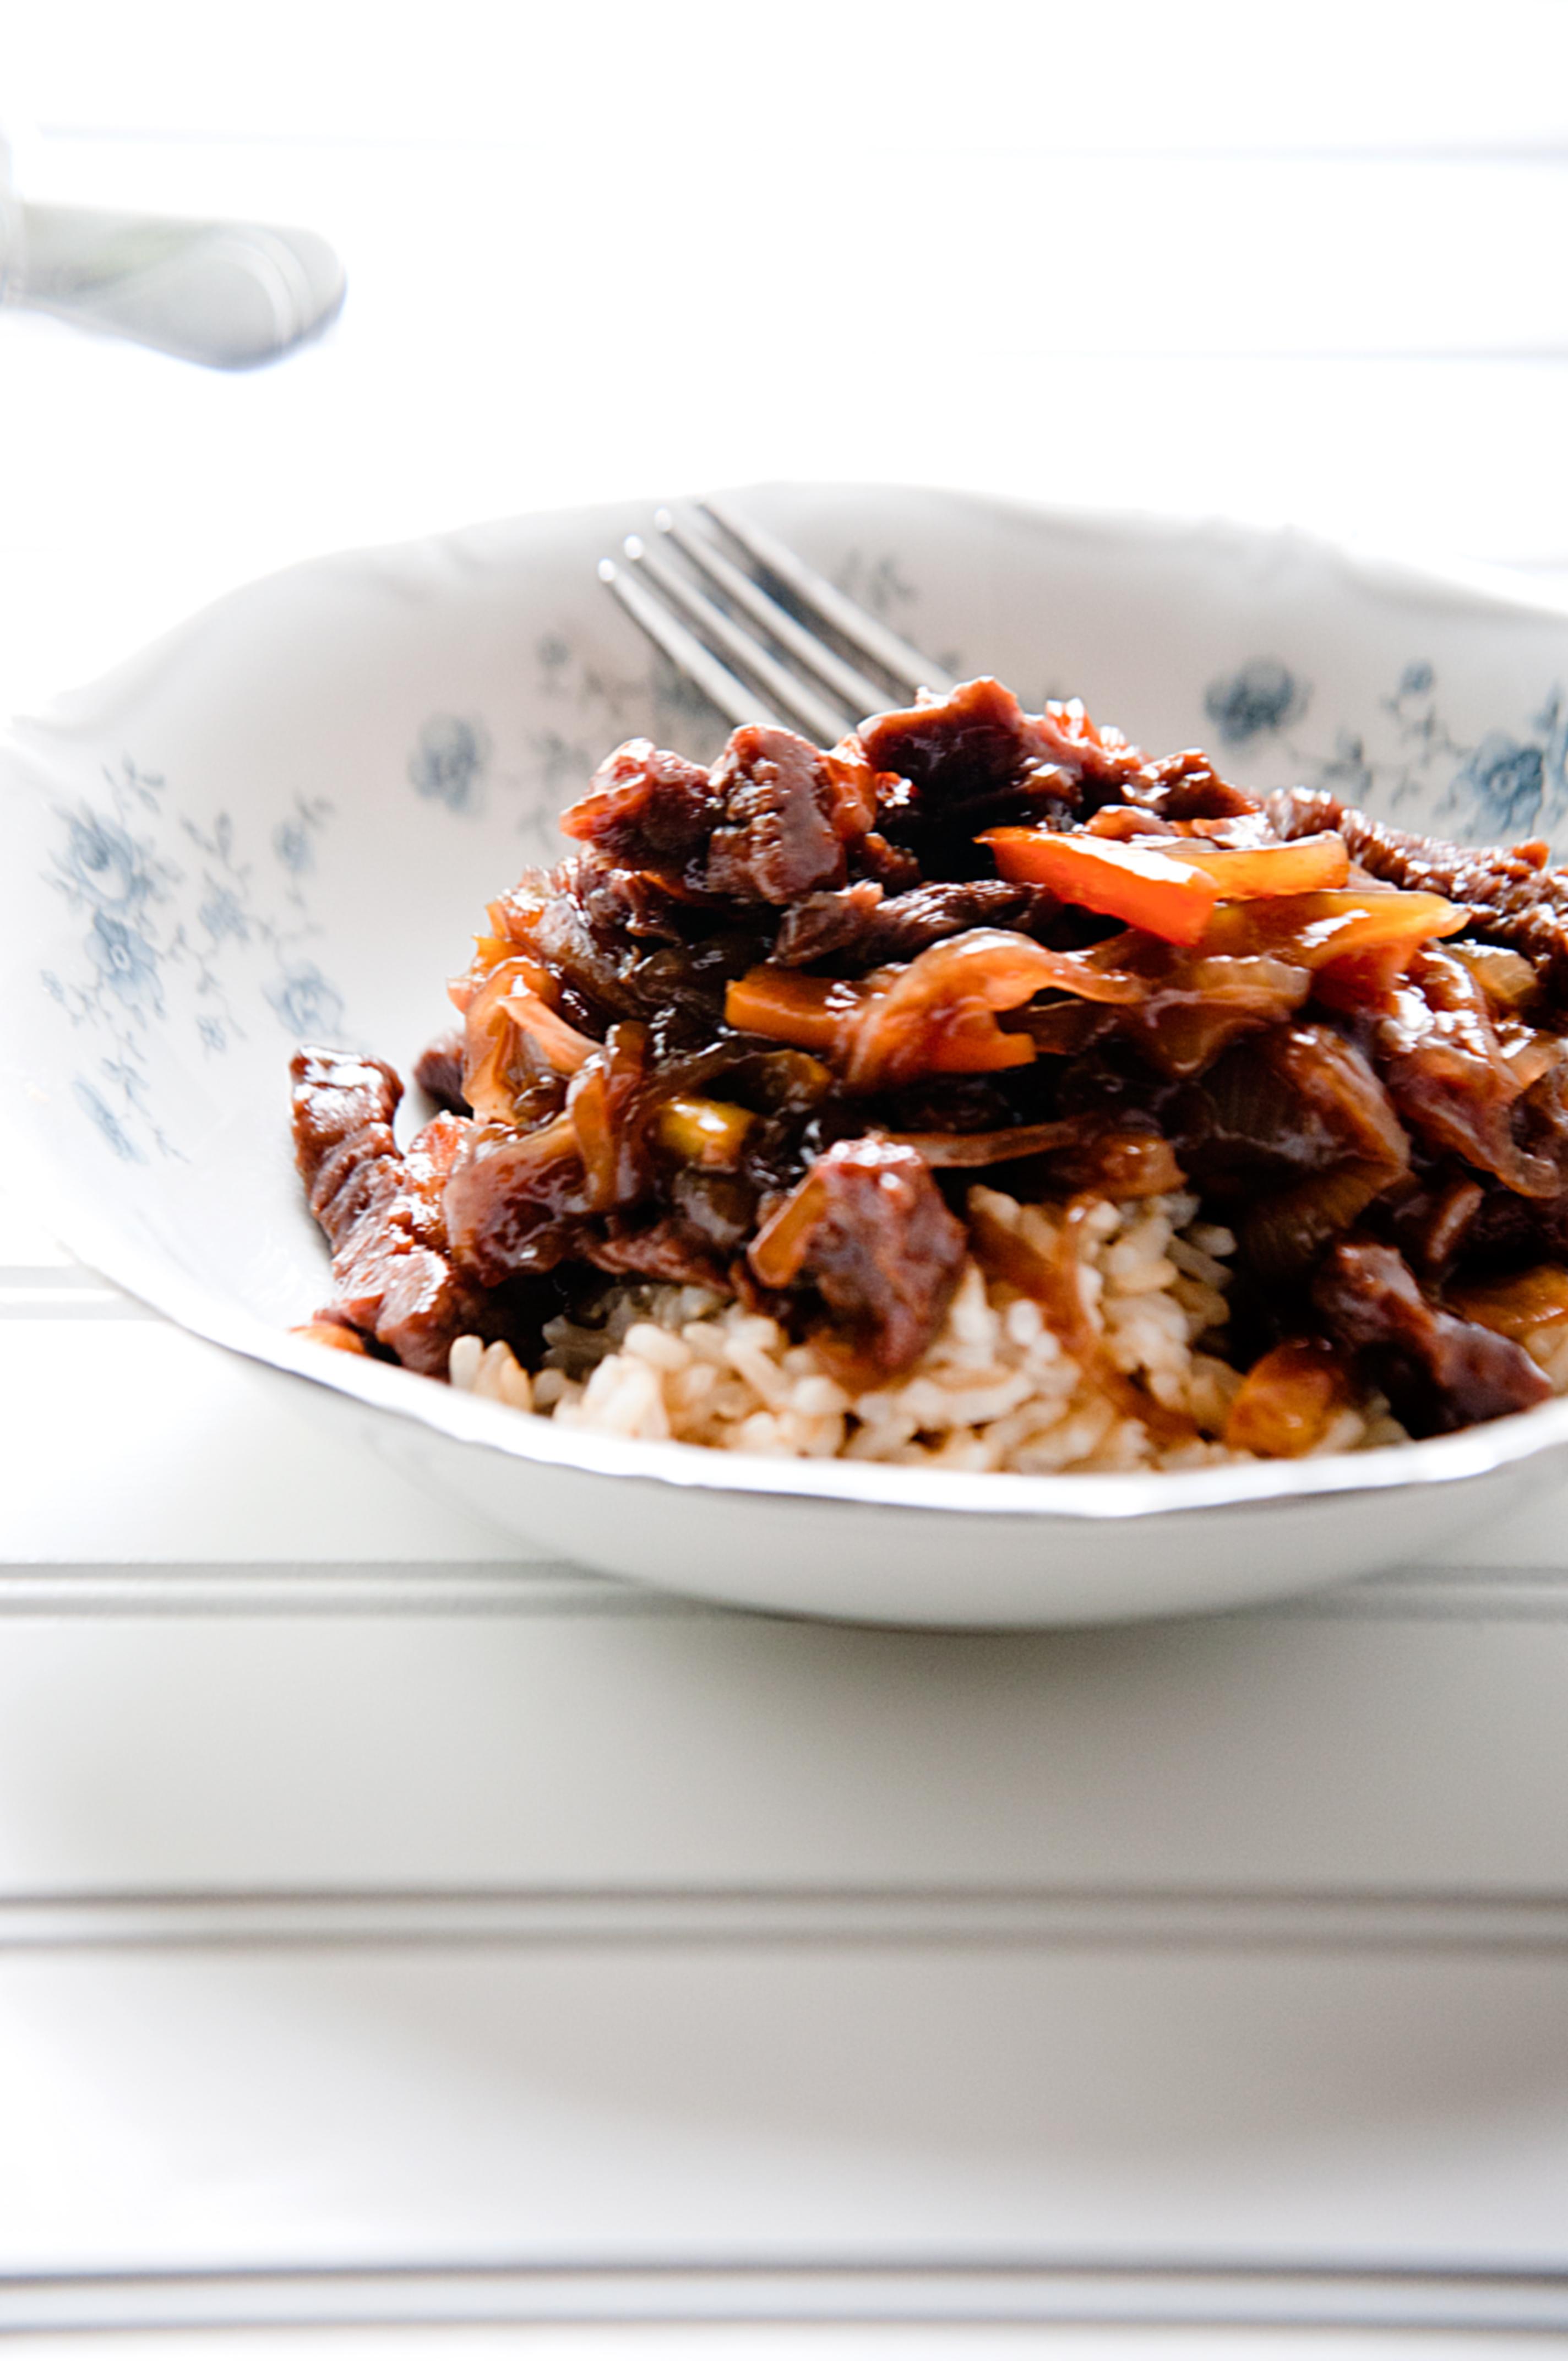 Korean Beef Bulgogi - Feed Me, SeymourFeed Me, Seymour